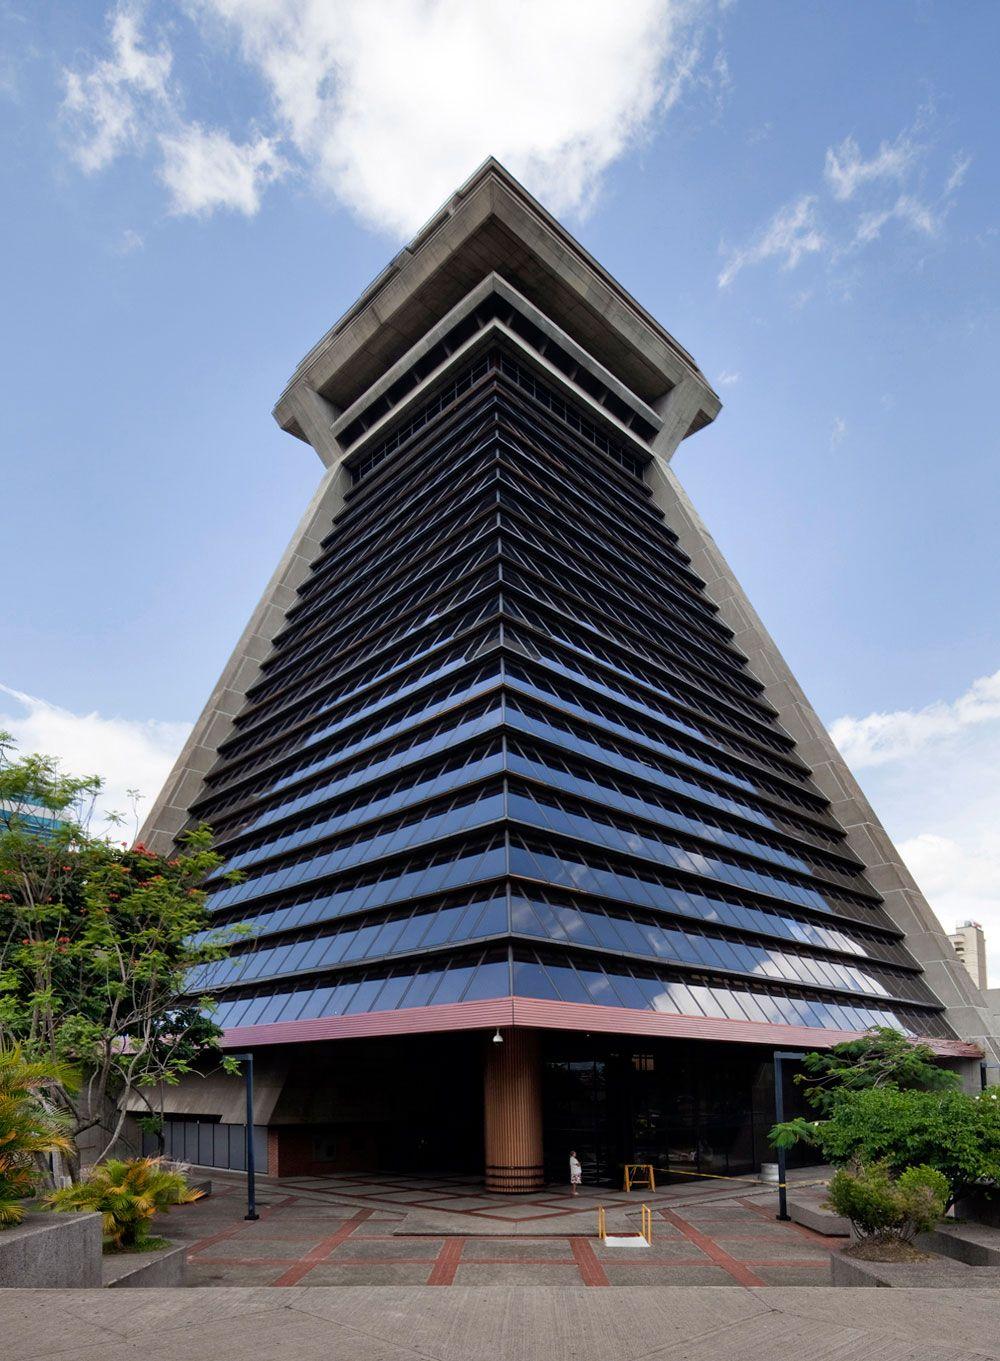 Glocalização: Contraloria General De La Republica, San Jose Costa Rica.  Architect: Raúl